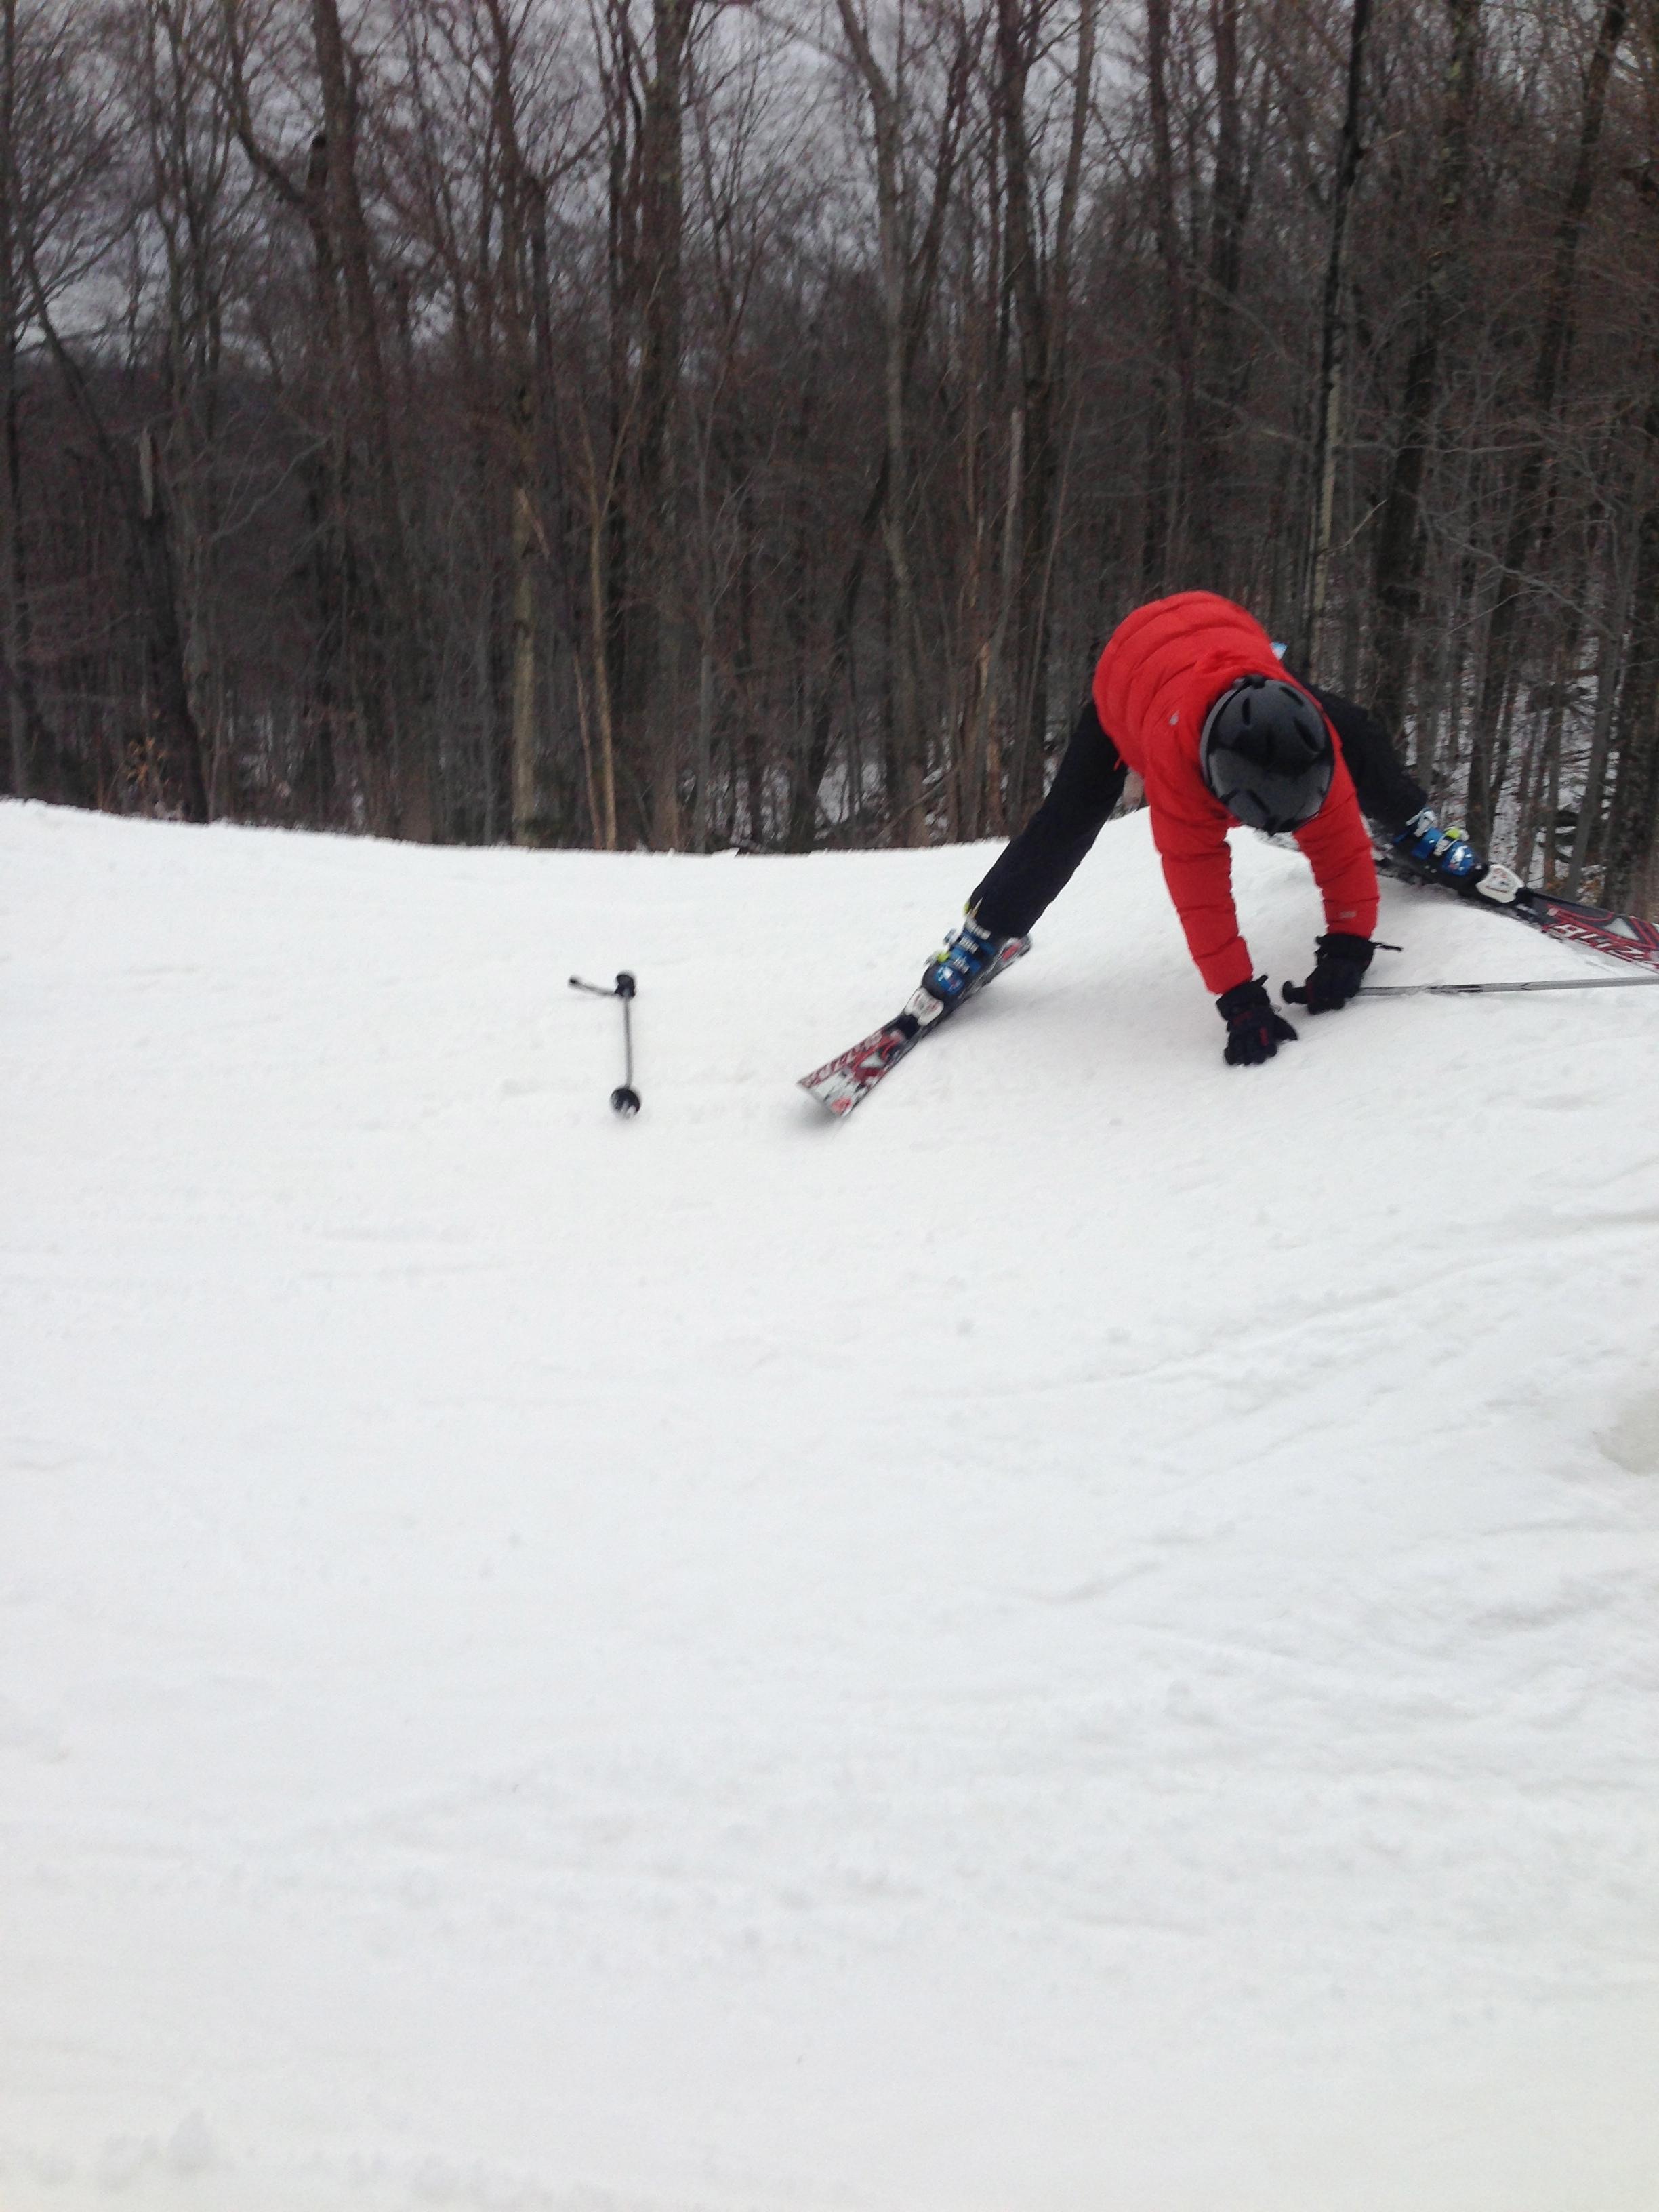 Mount Snow gaper 12/29/13